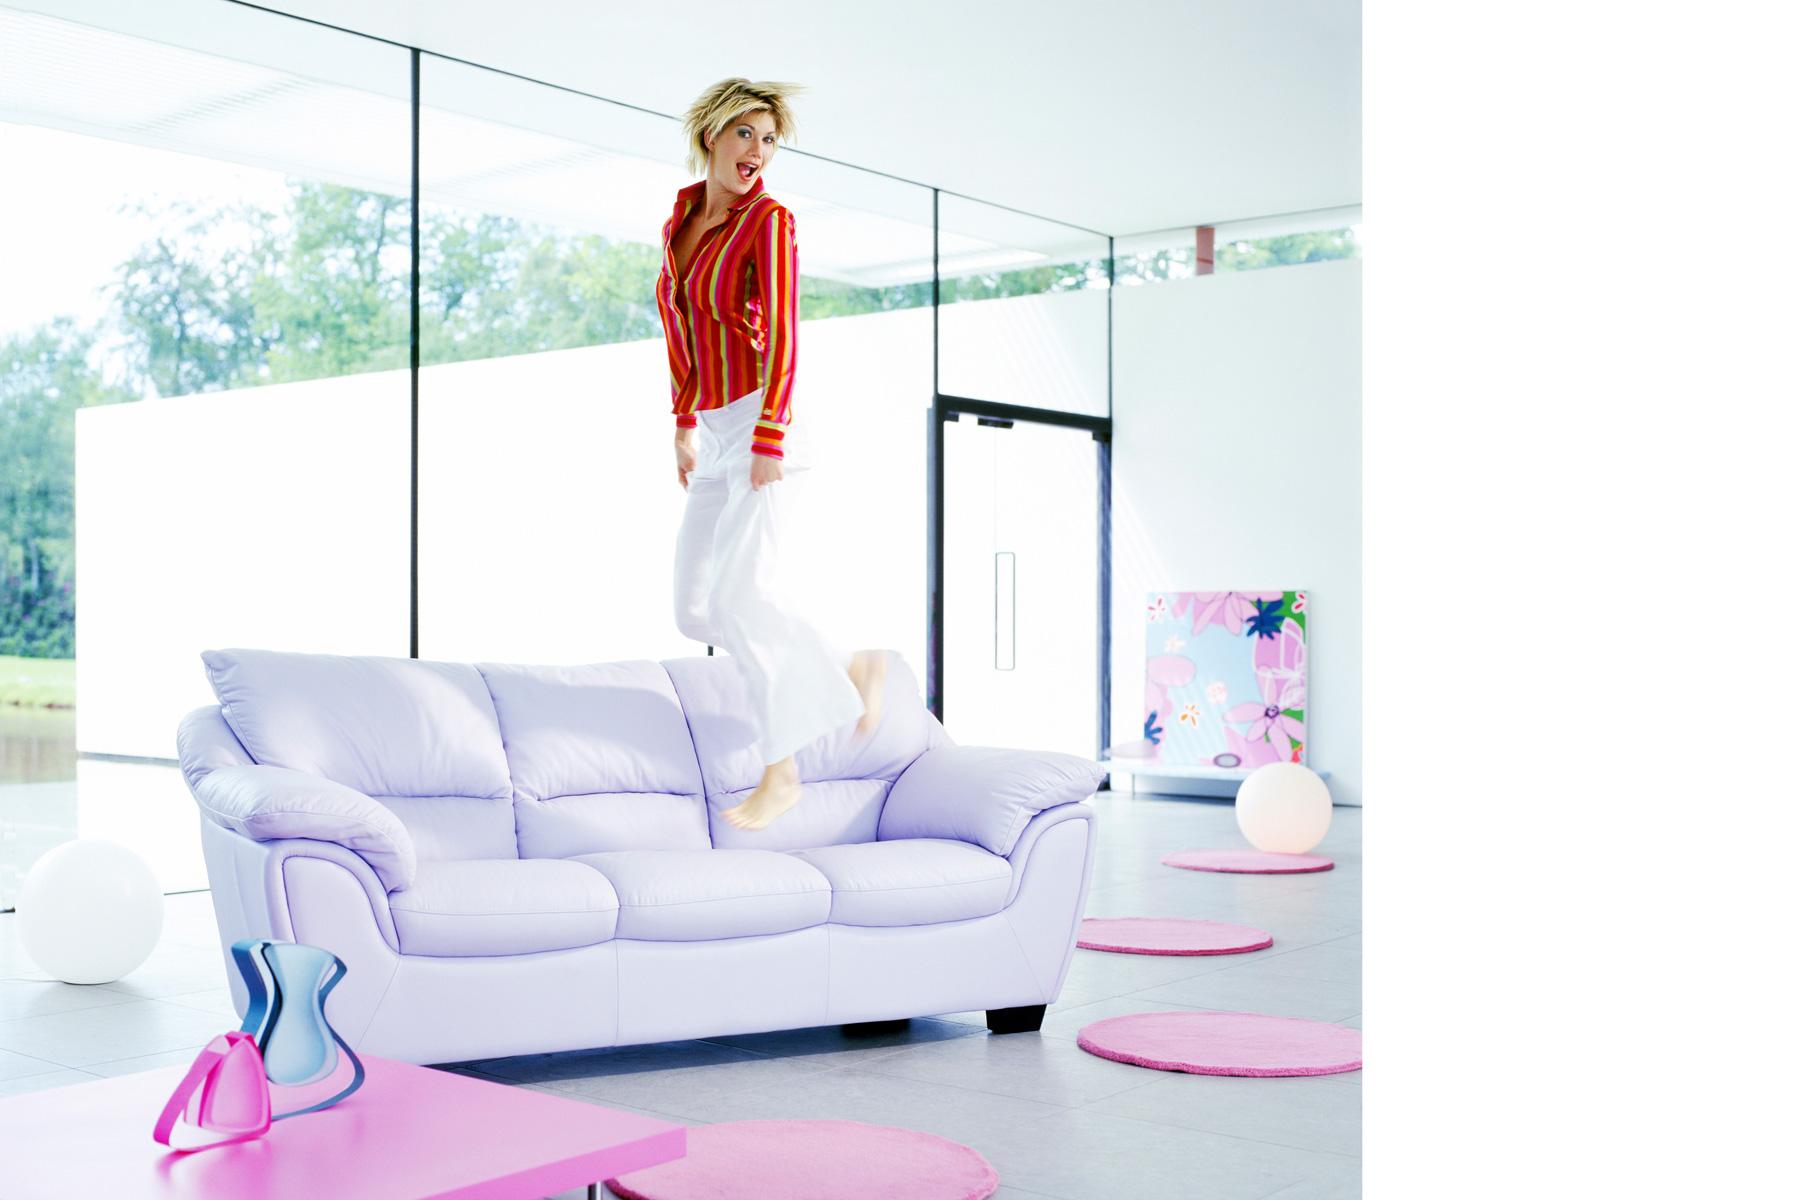 richard goulding fashion & lifestyle photographer_SQ_15.jpg